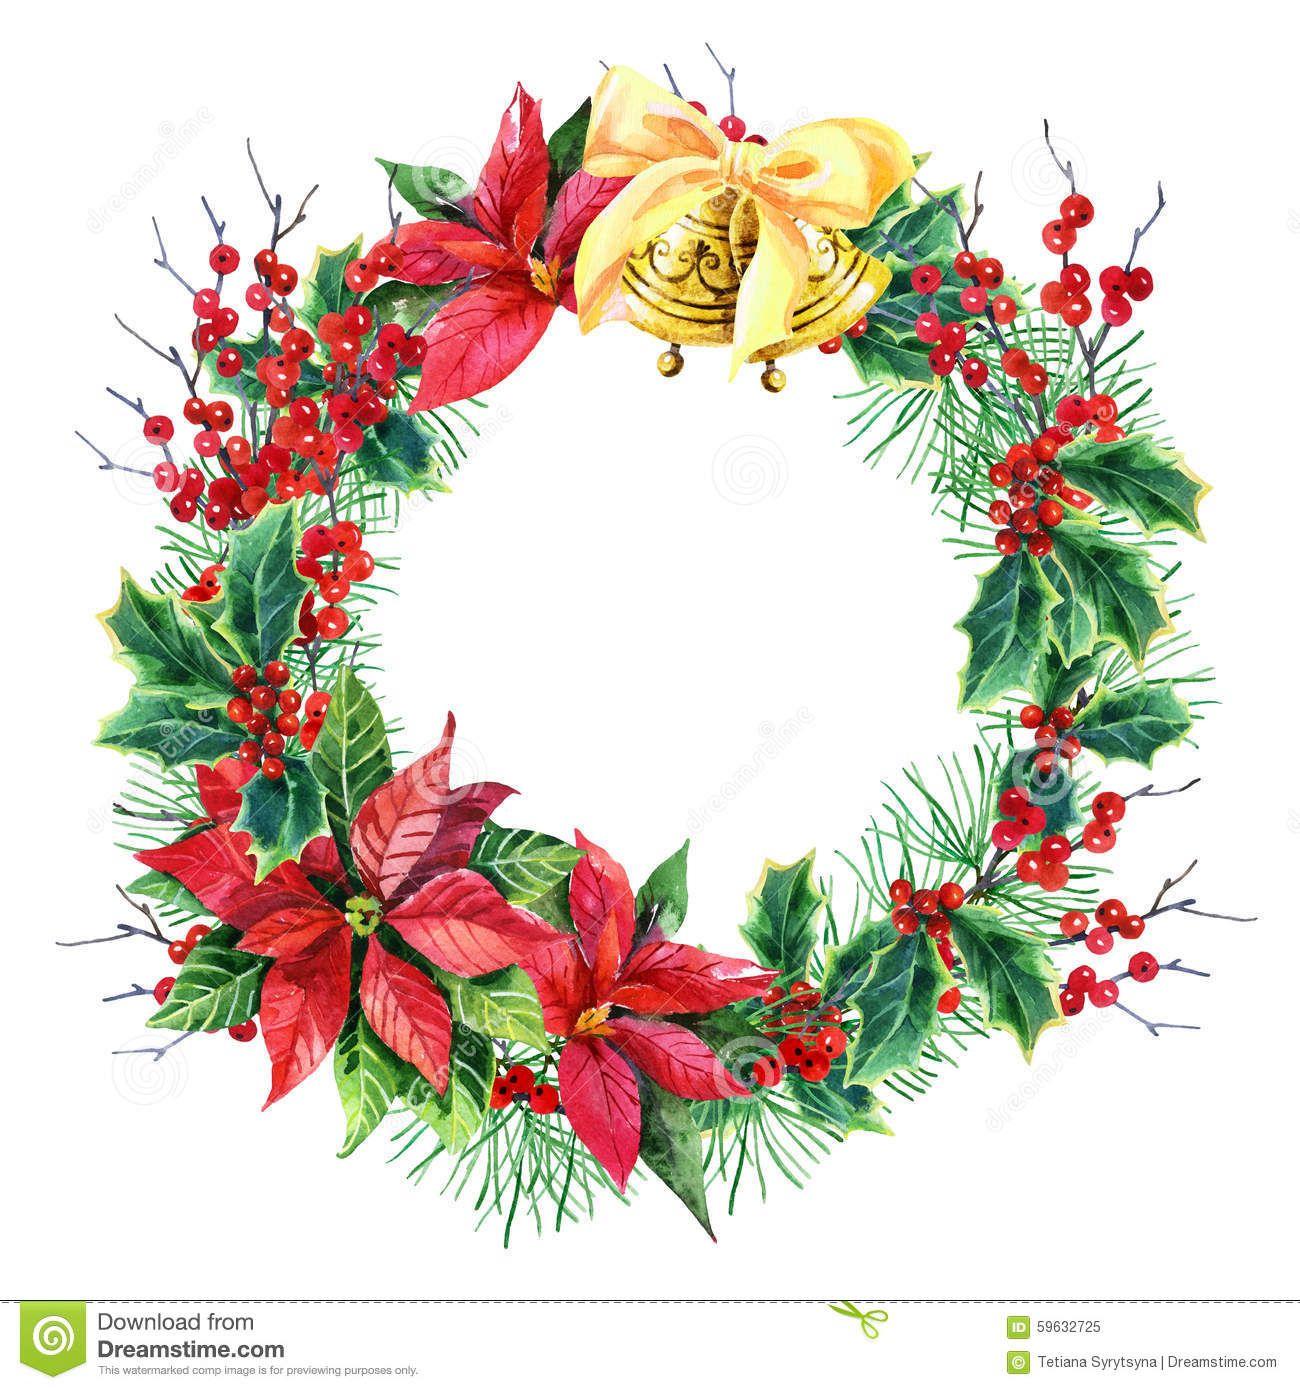 Watercolor Christmas Wreath Poinsettia Plant Pine Tree Branches Holly Plant Bells Hand Painted Illustration 59632725 Jpg 1300 1390 크리스마스 리스 리스 크리스마스